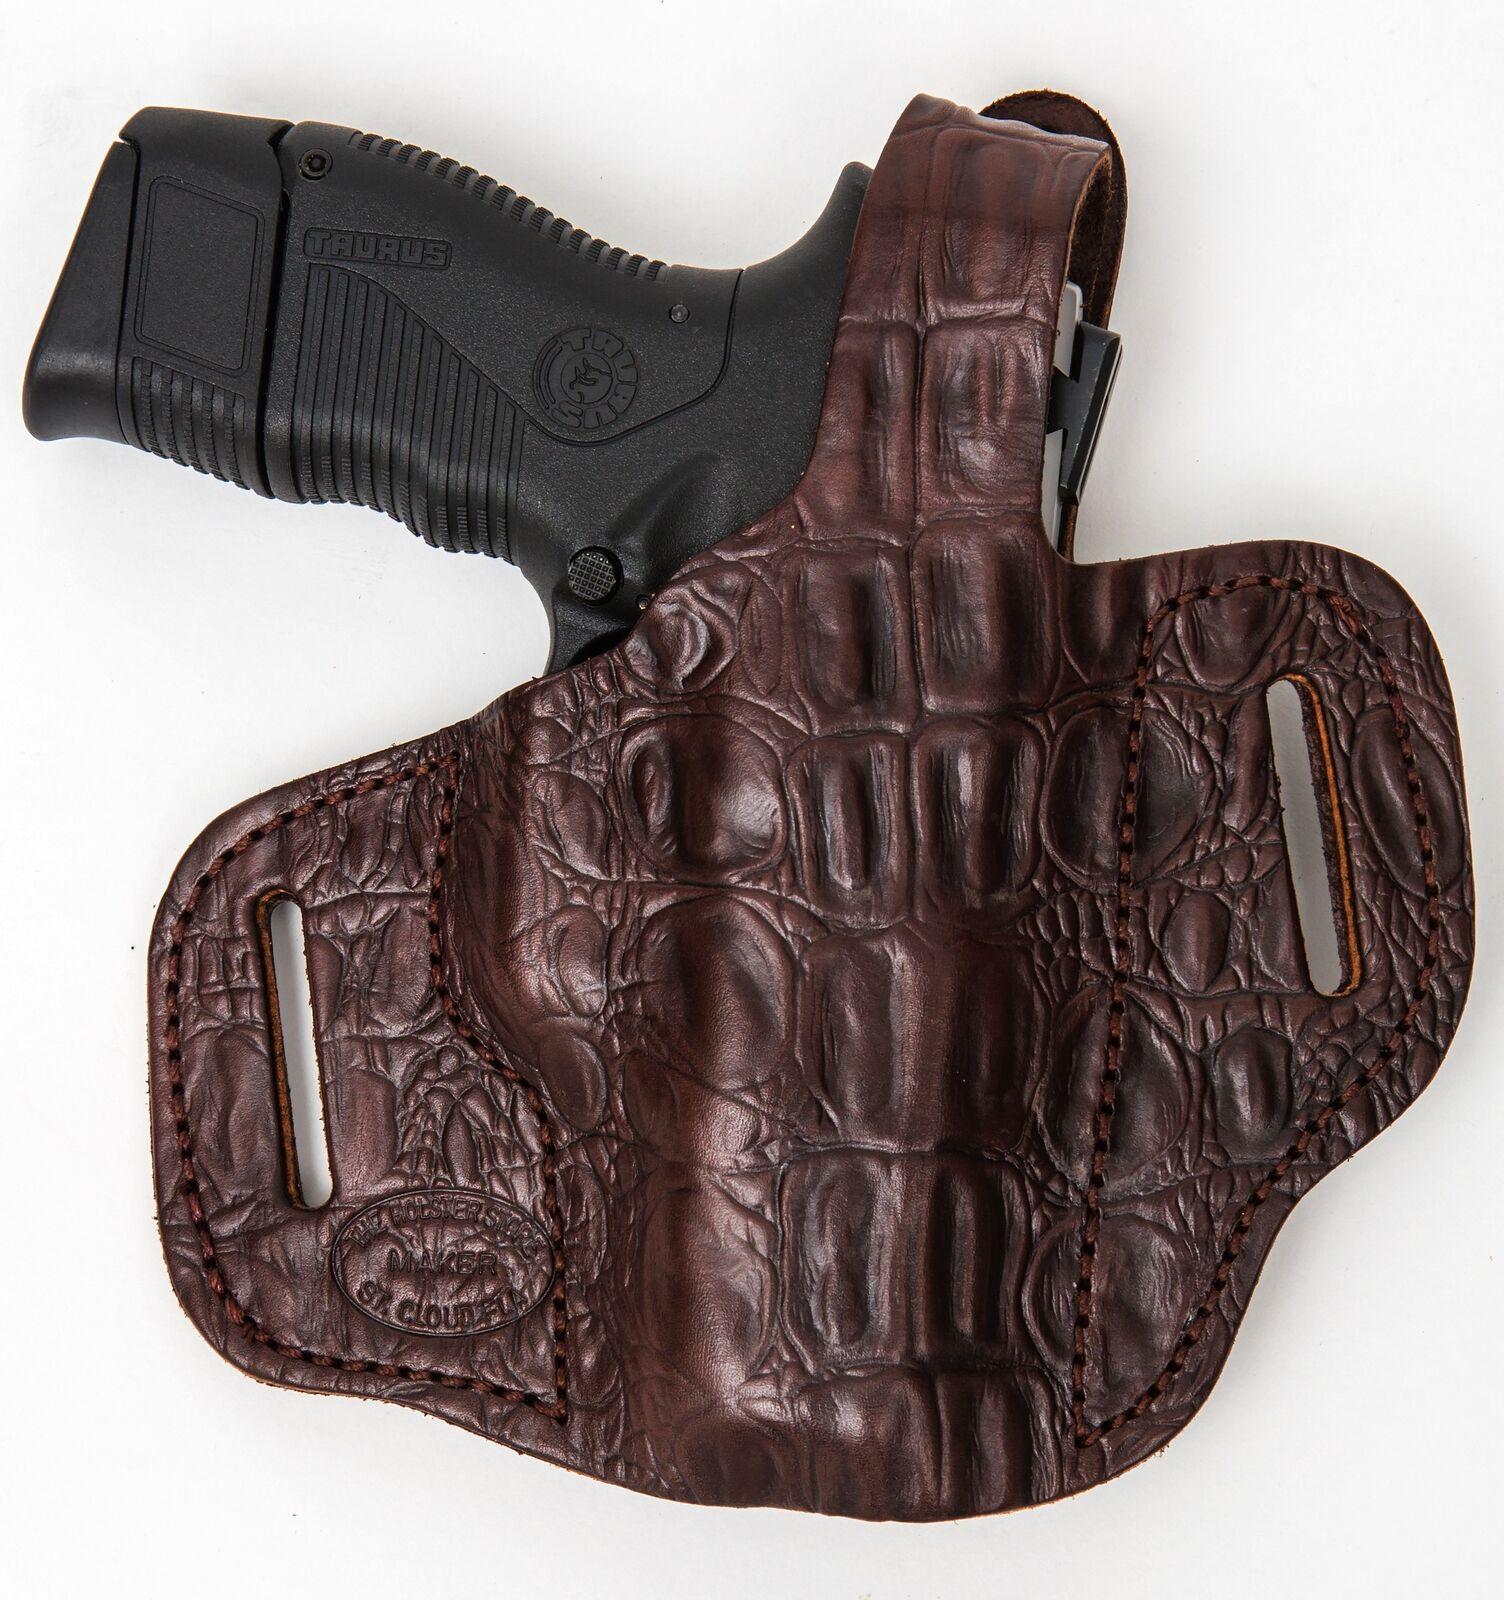 On Duty Conceal RH LH OWB Leder Gun Holster For S&W S&W For Bodyguard 38 03795d